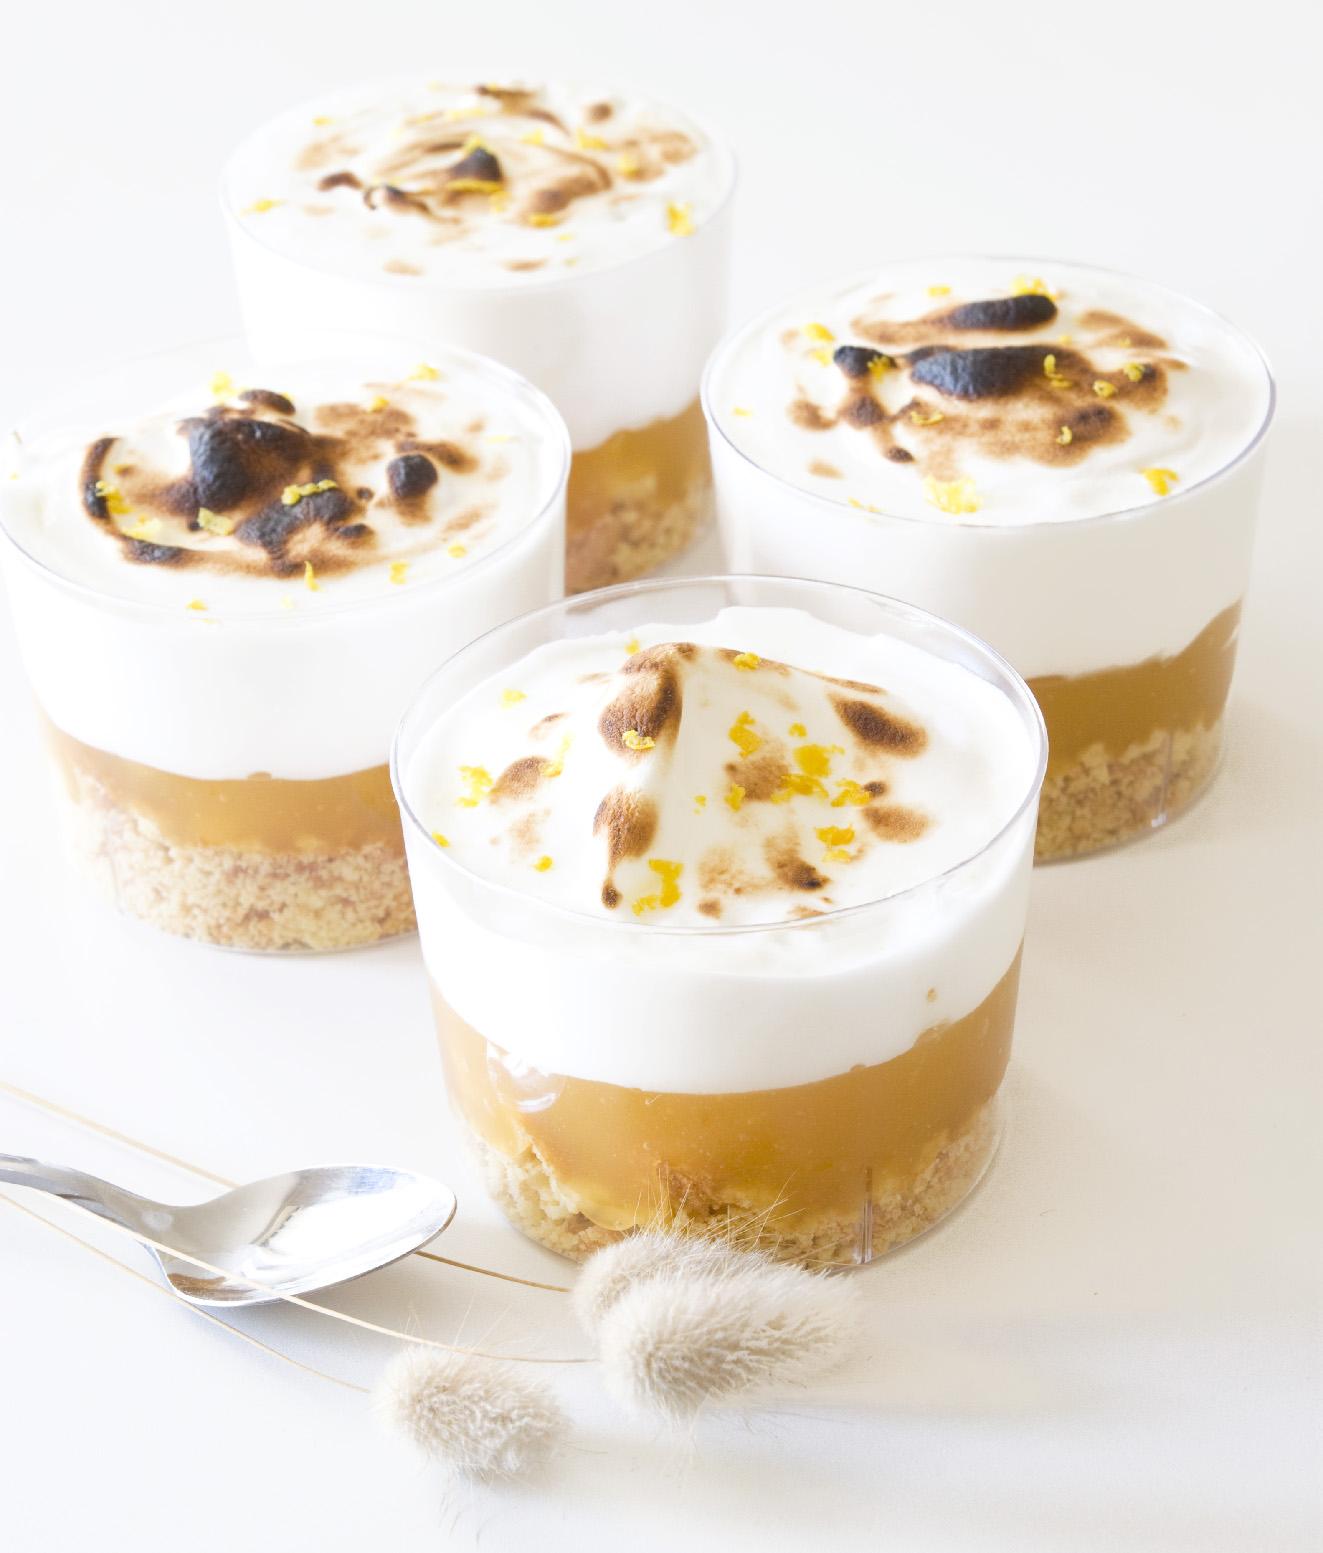 tarte-citron-meringuee-verrines-blog-agathe-duchesne-recette-agatwe-1